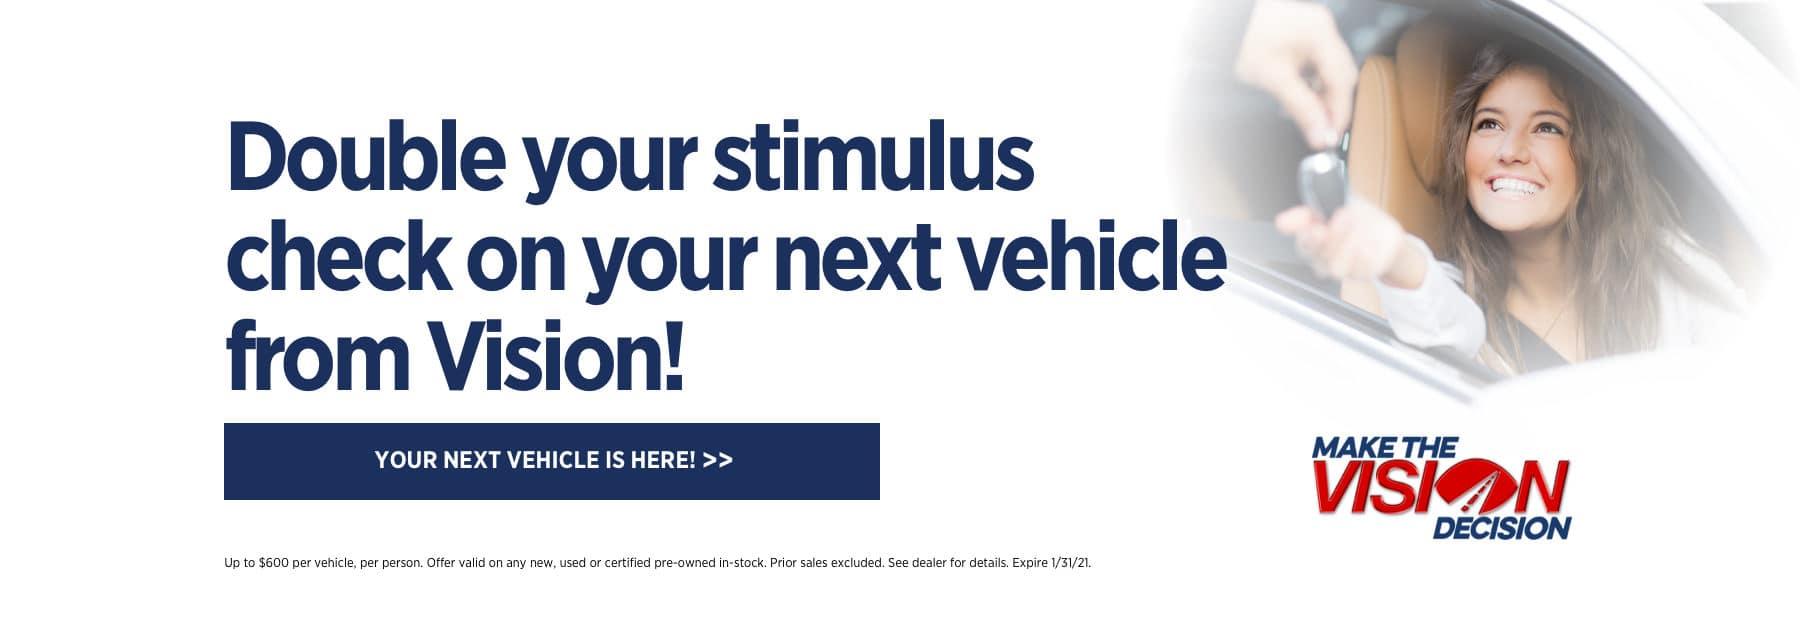 Vision-Hyundai-Sliders-0106-Stim-Check3